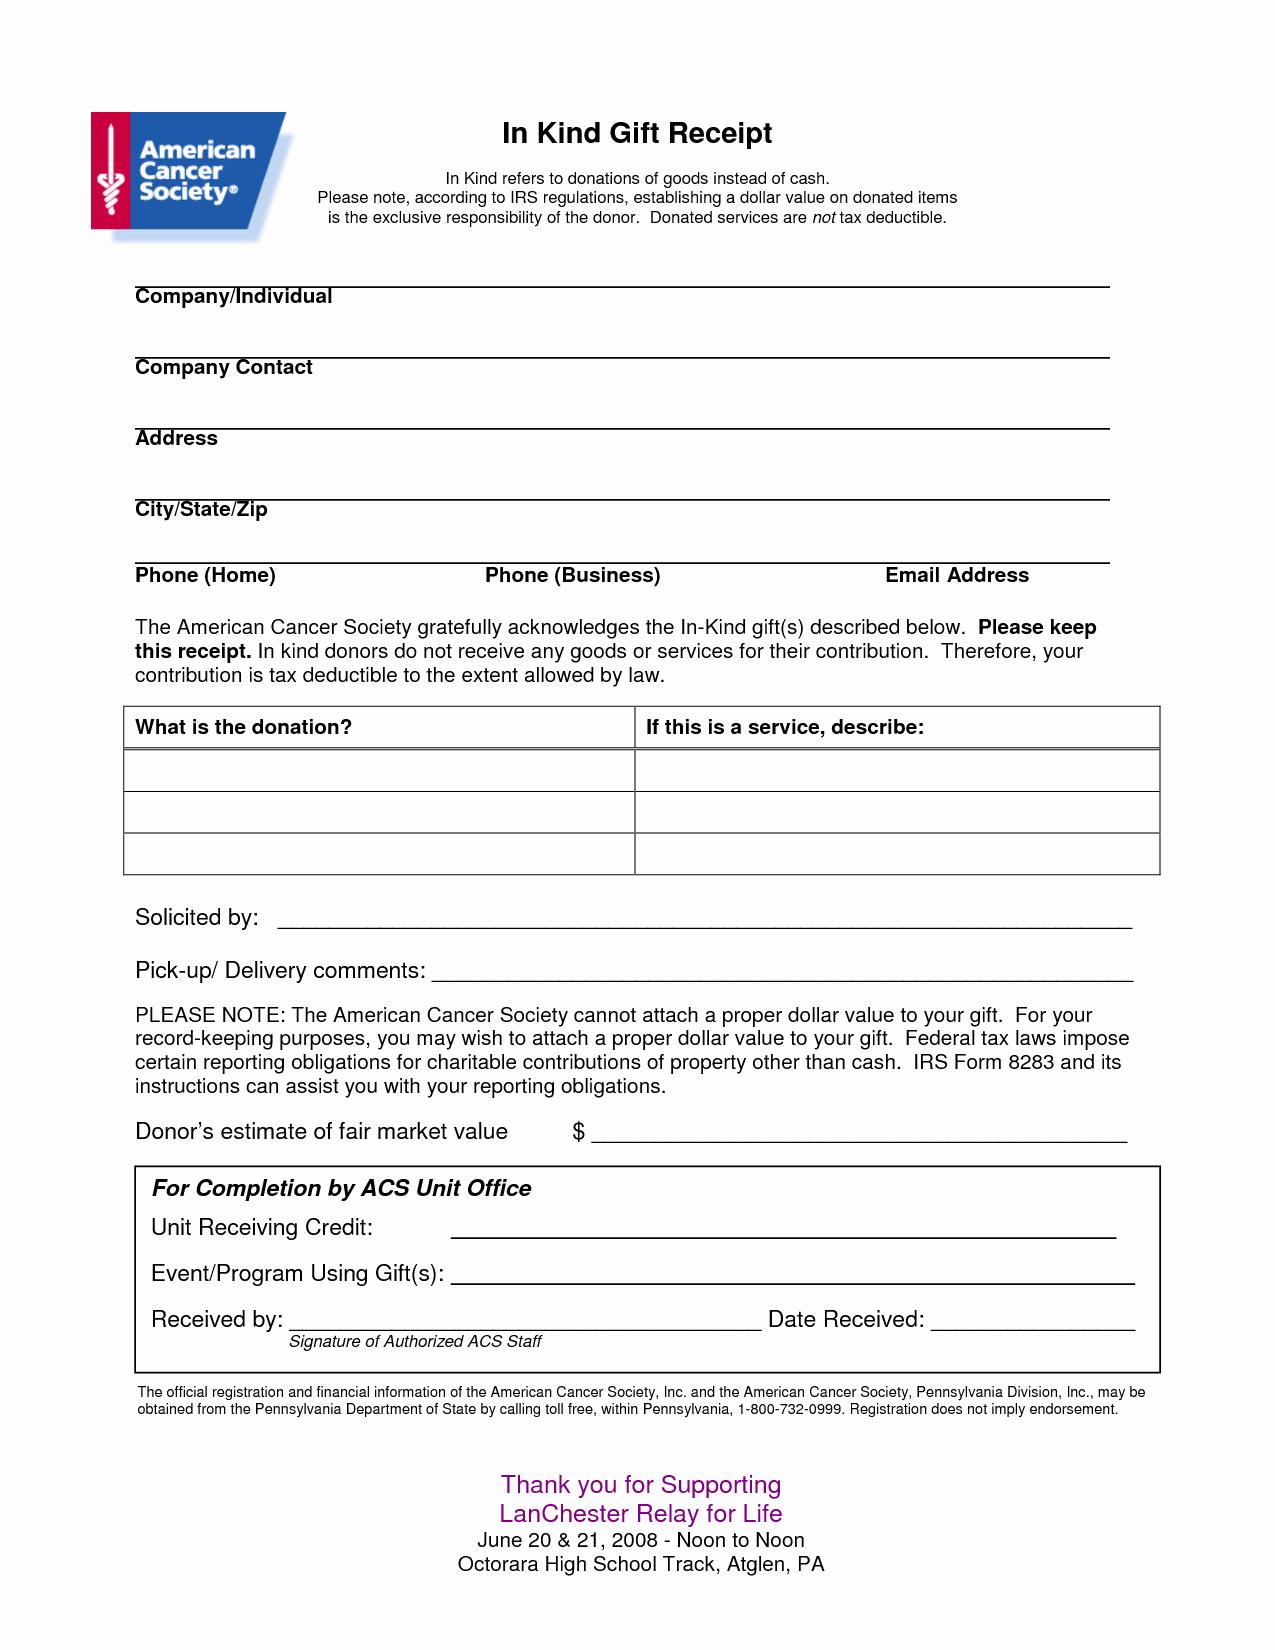 Nonprofit Donation Receipt Template Elegant Non Profit Receipt Of Cash Donation Letter Template